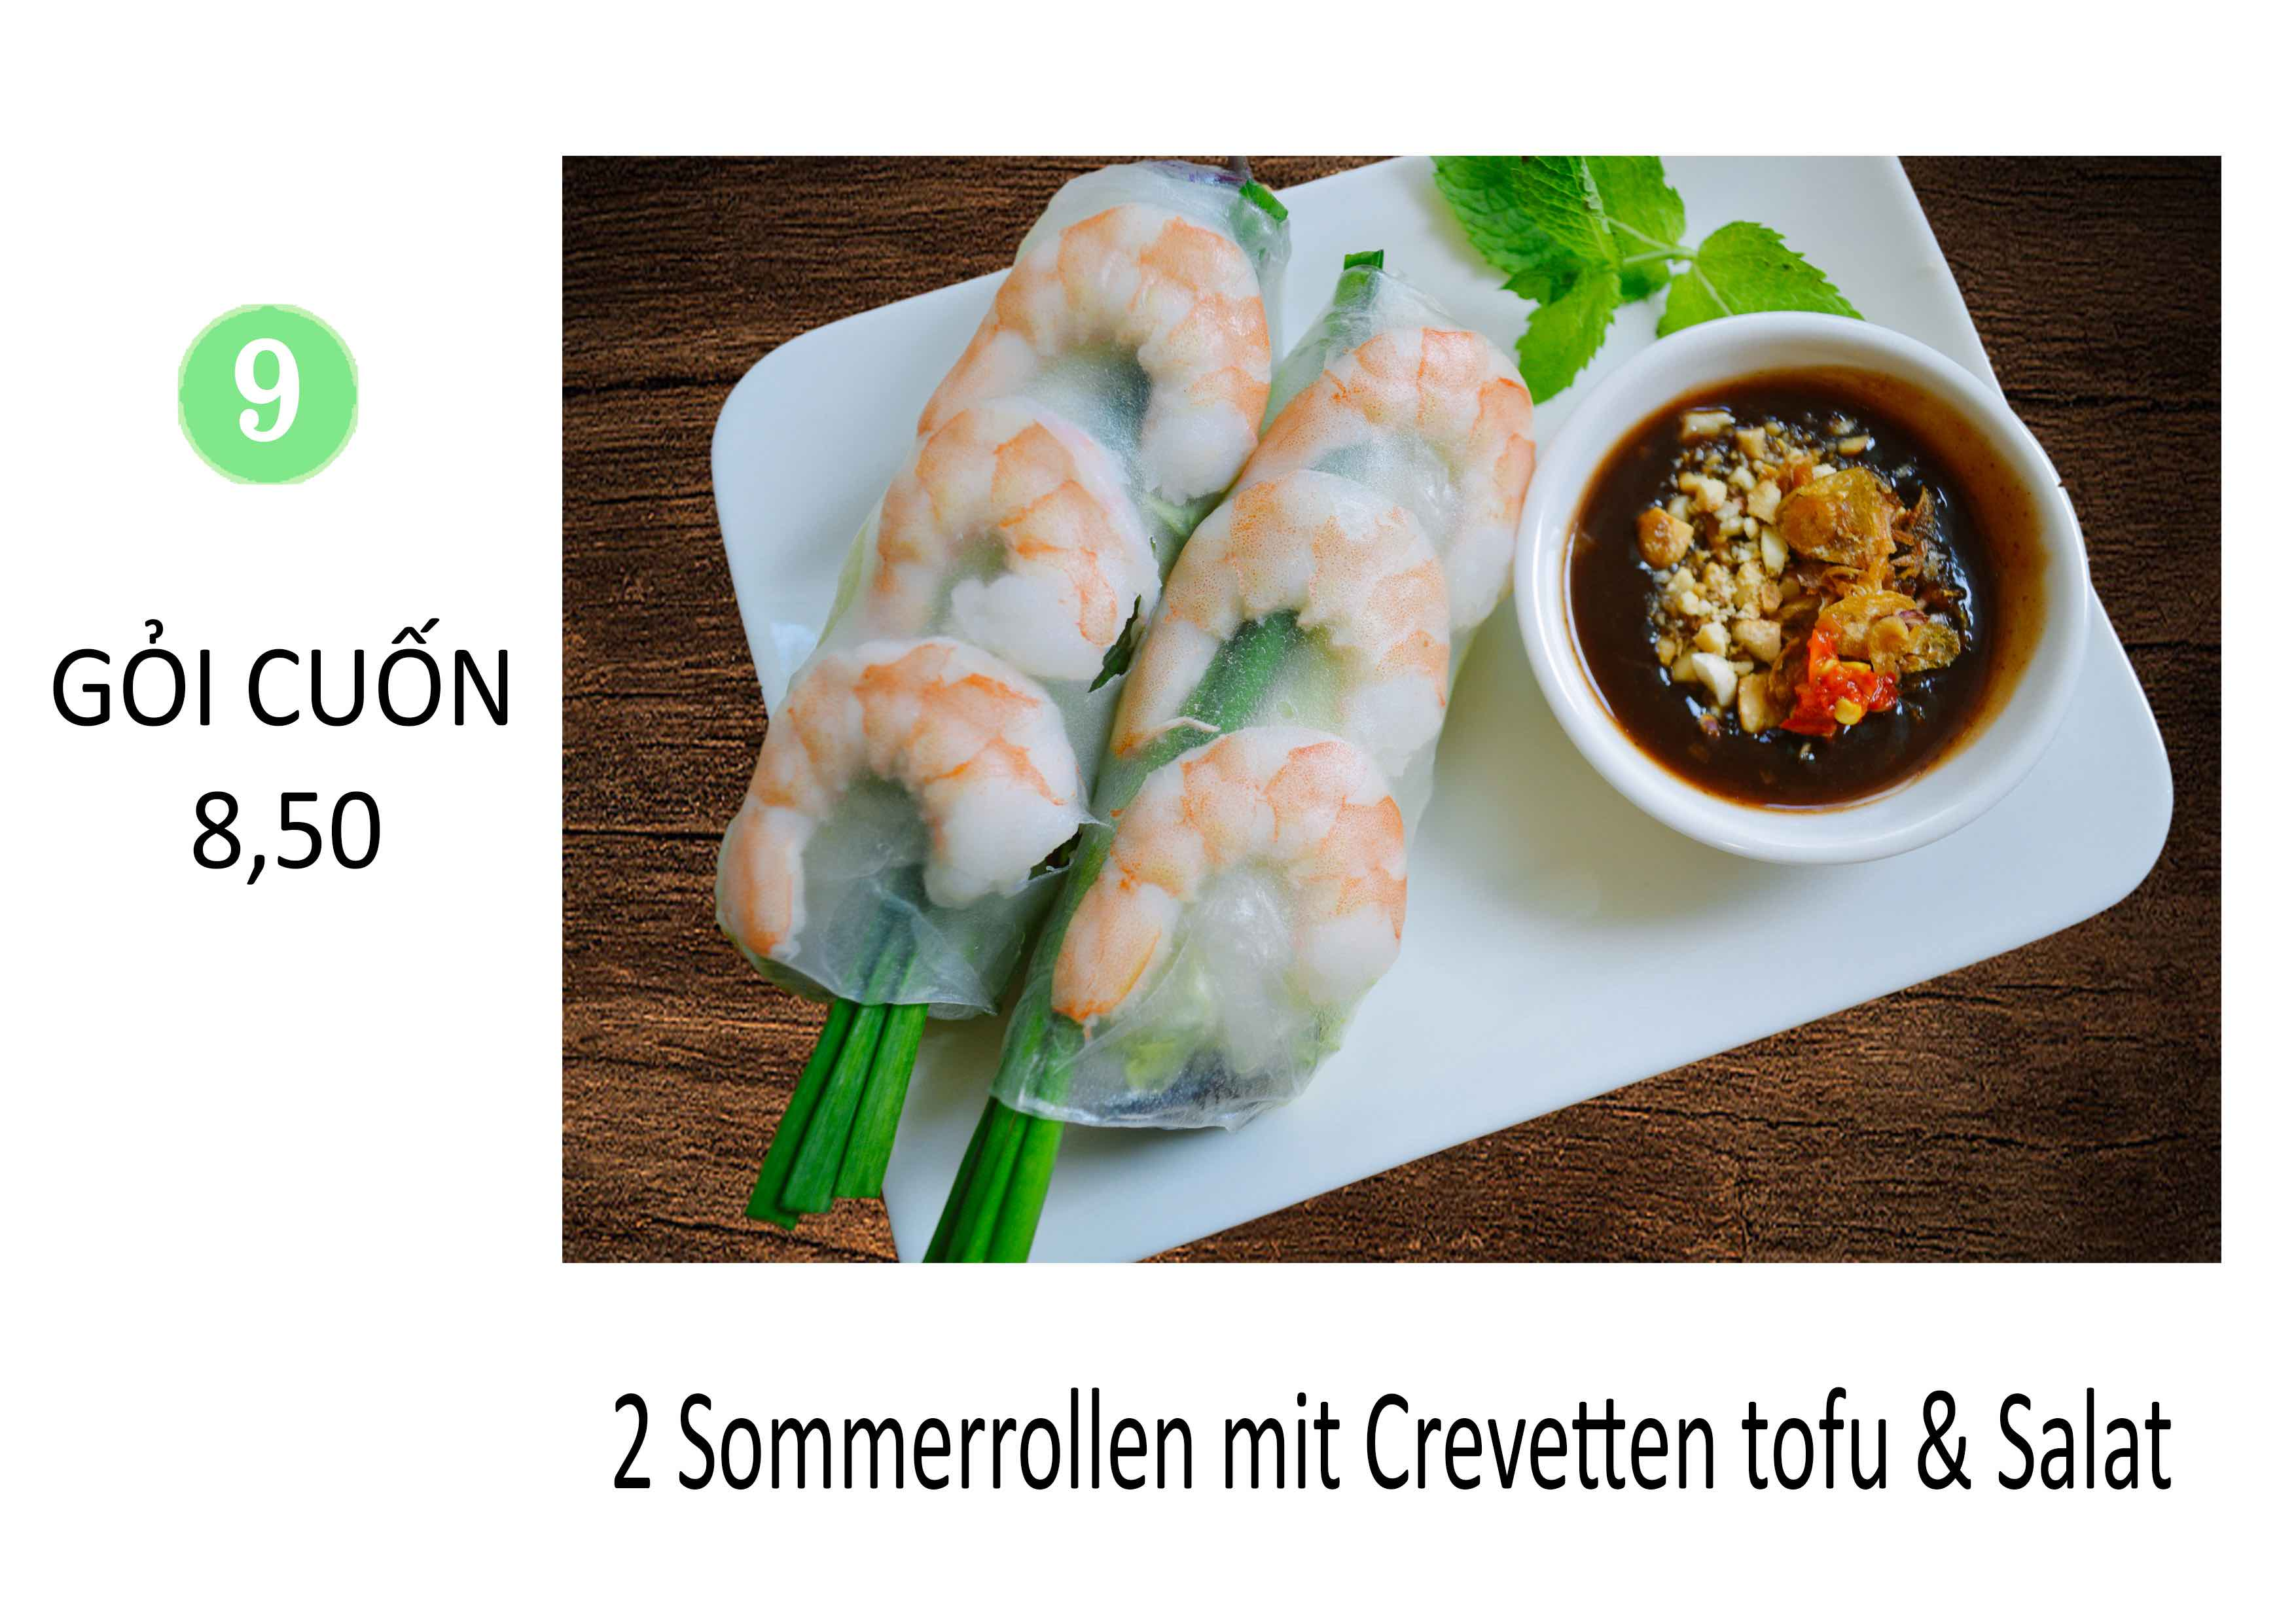 Sommerrollen mit Crevetten tofu